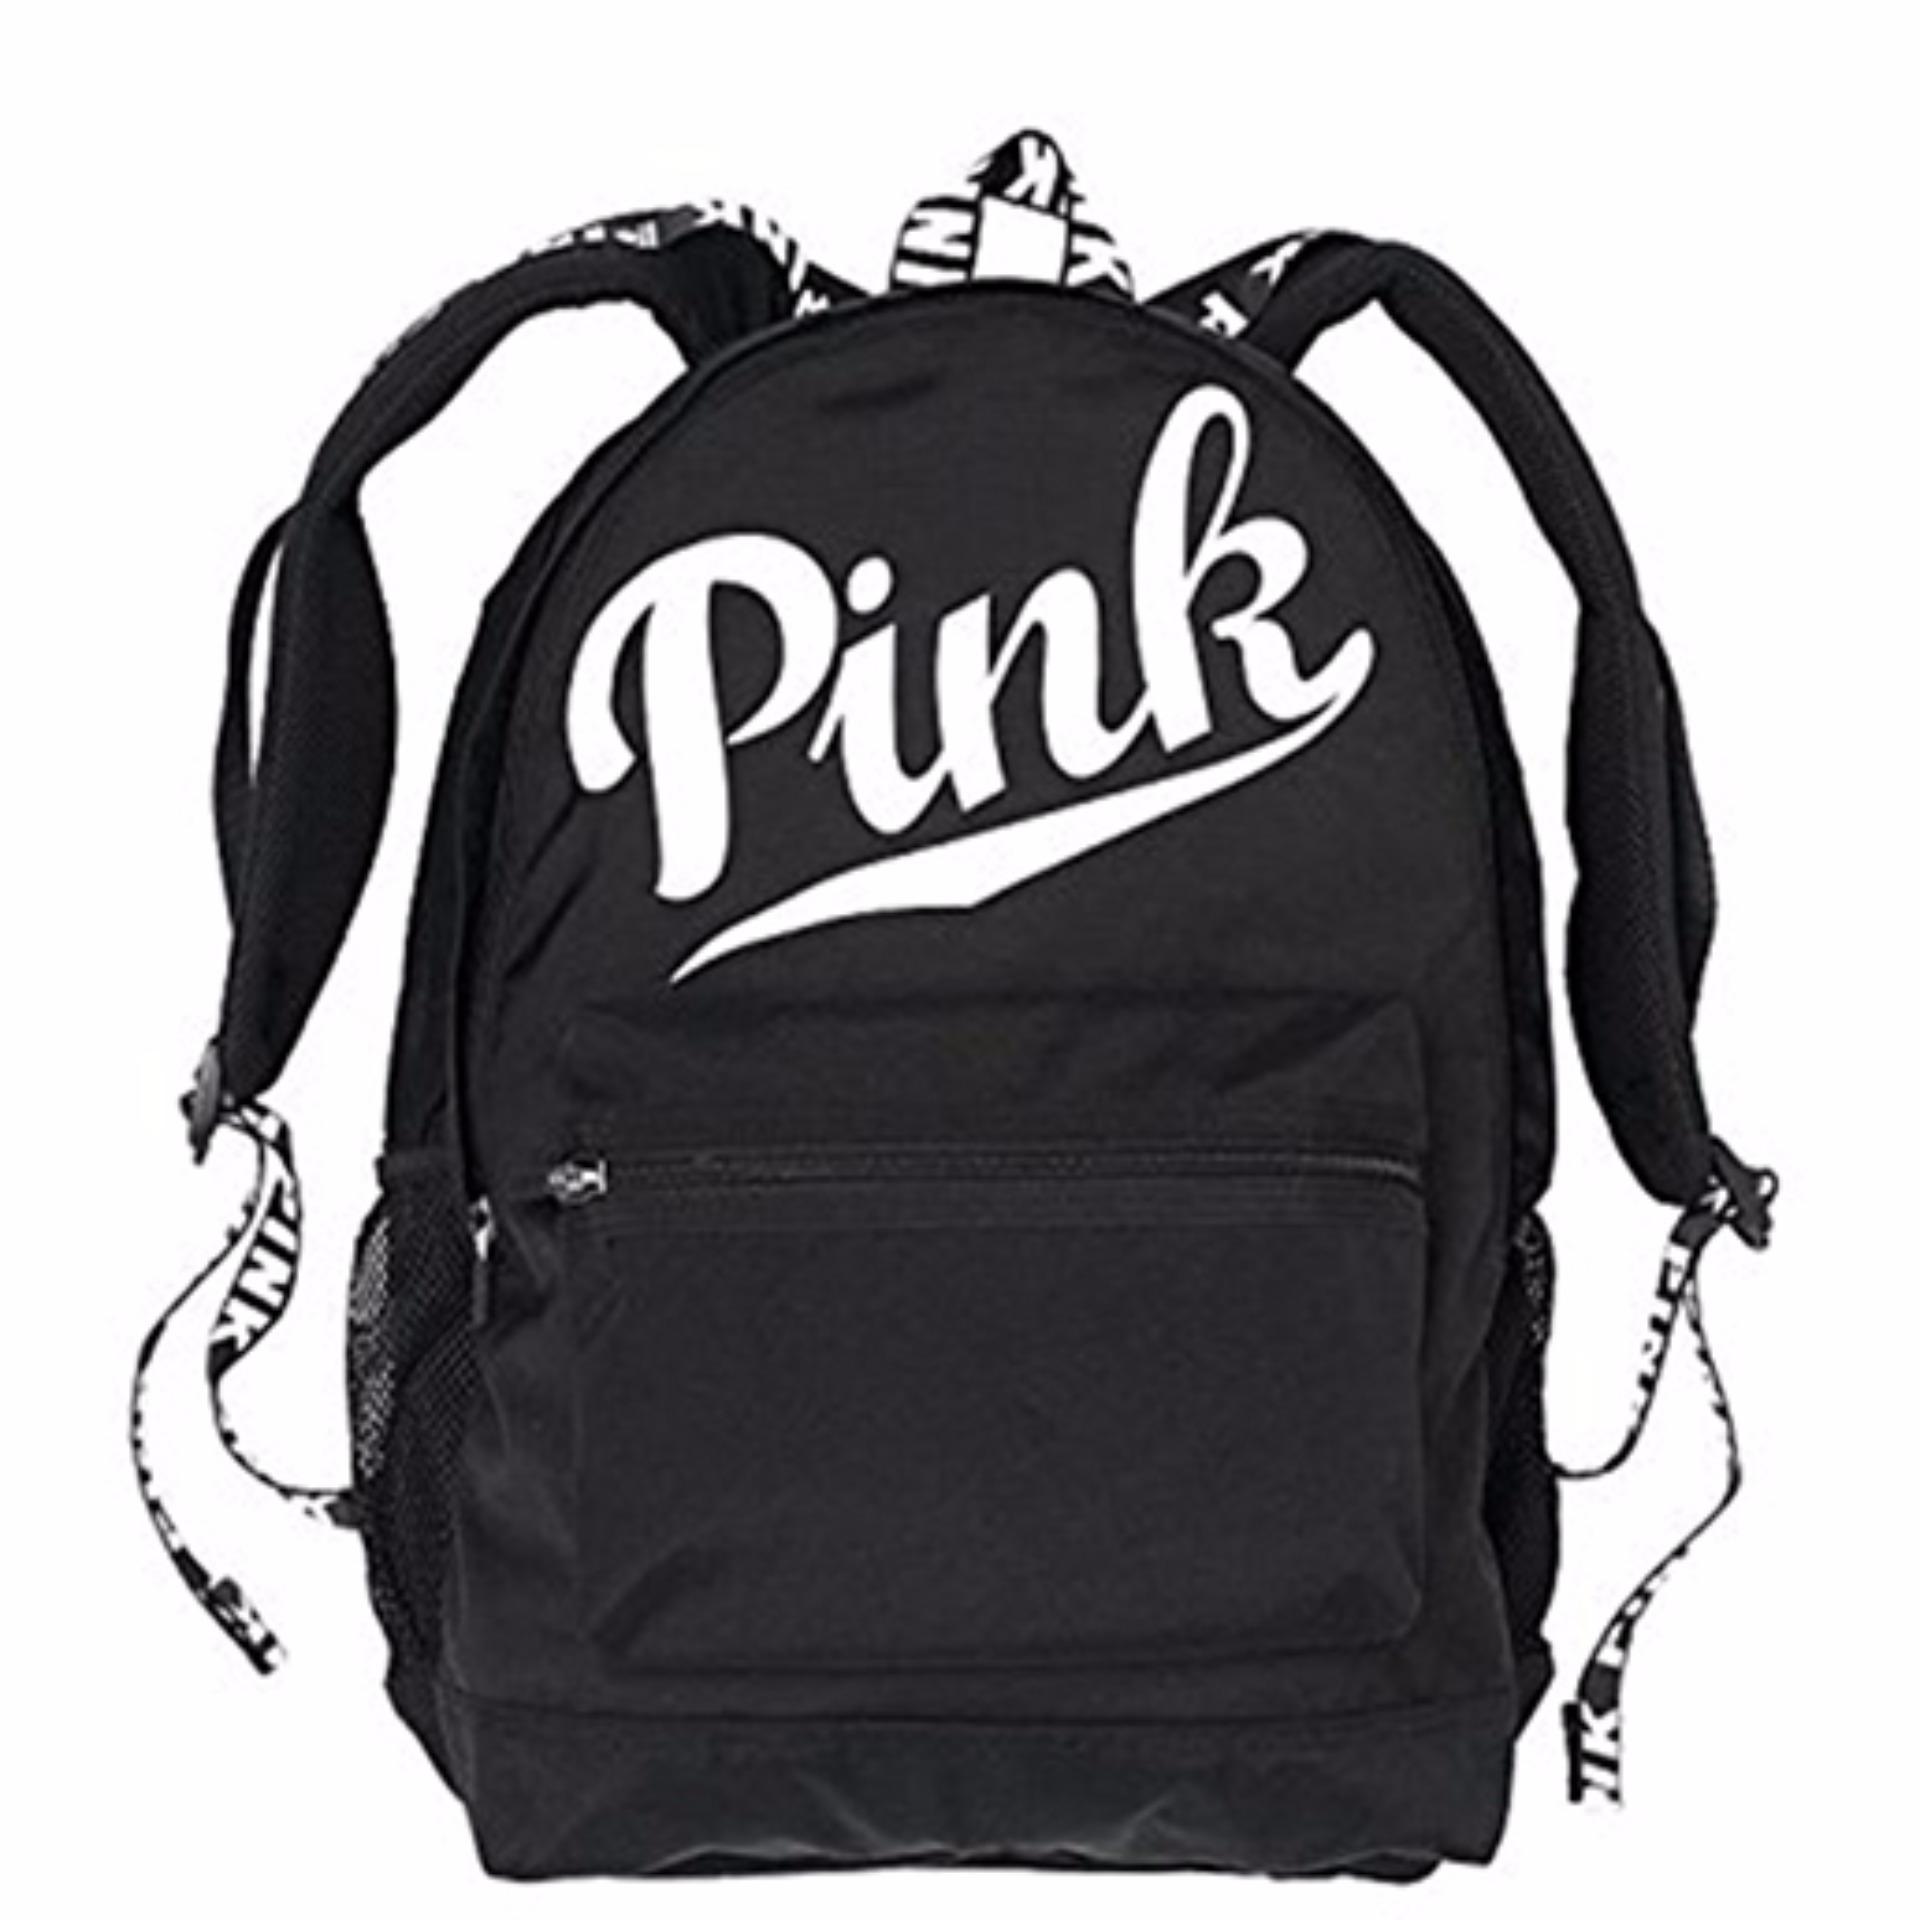 9b3568ad76645 Cheap Victoria Secret Pink Campus Backpack- Fenix Toulouse Handball